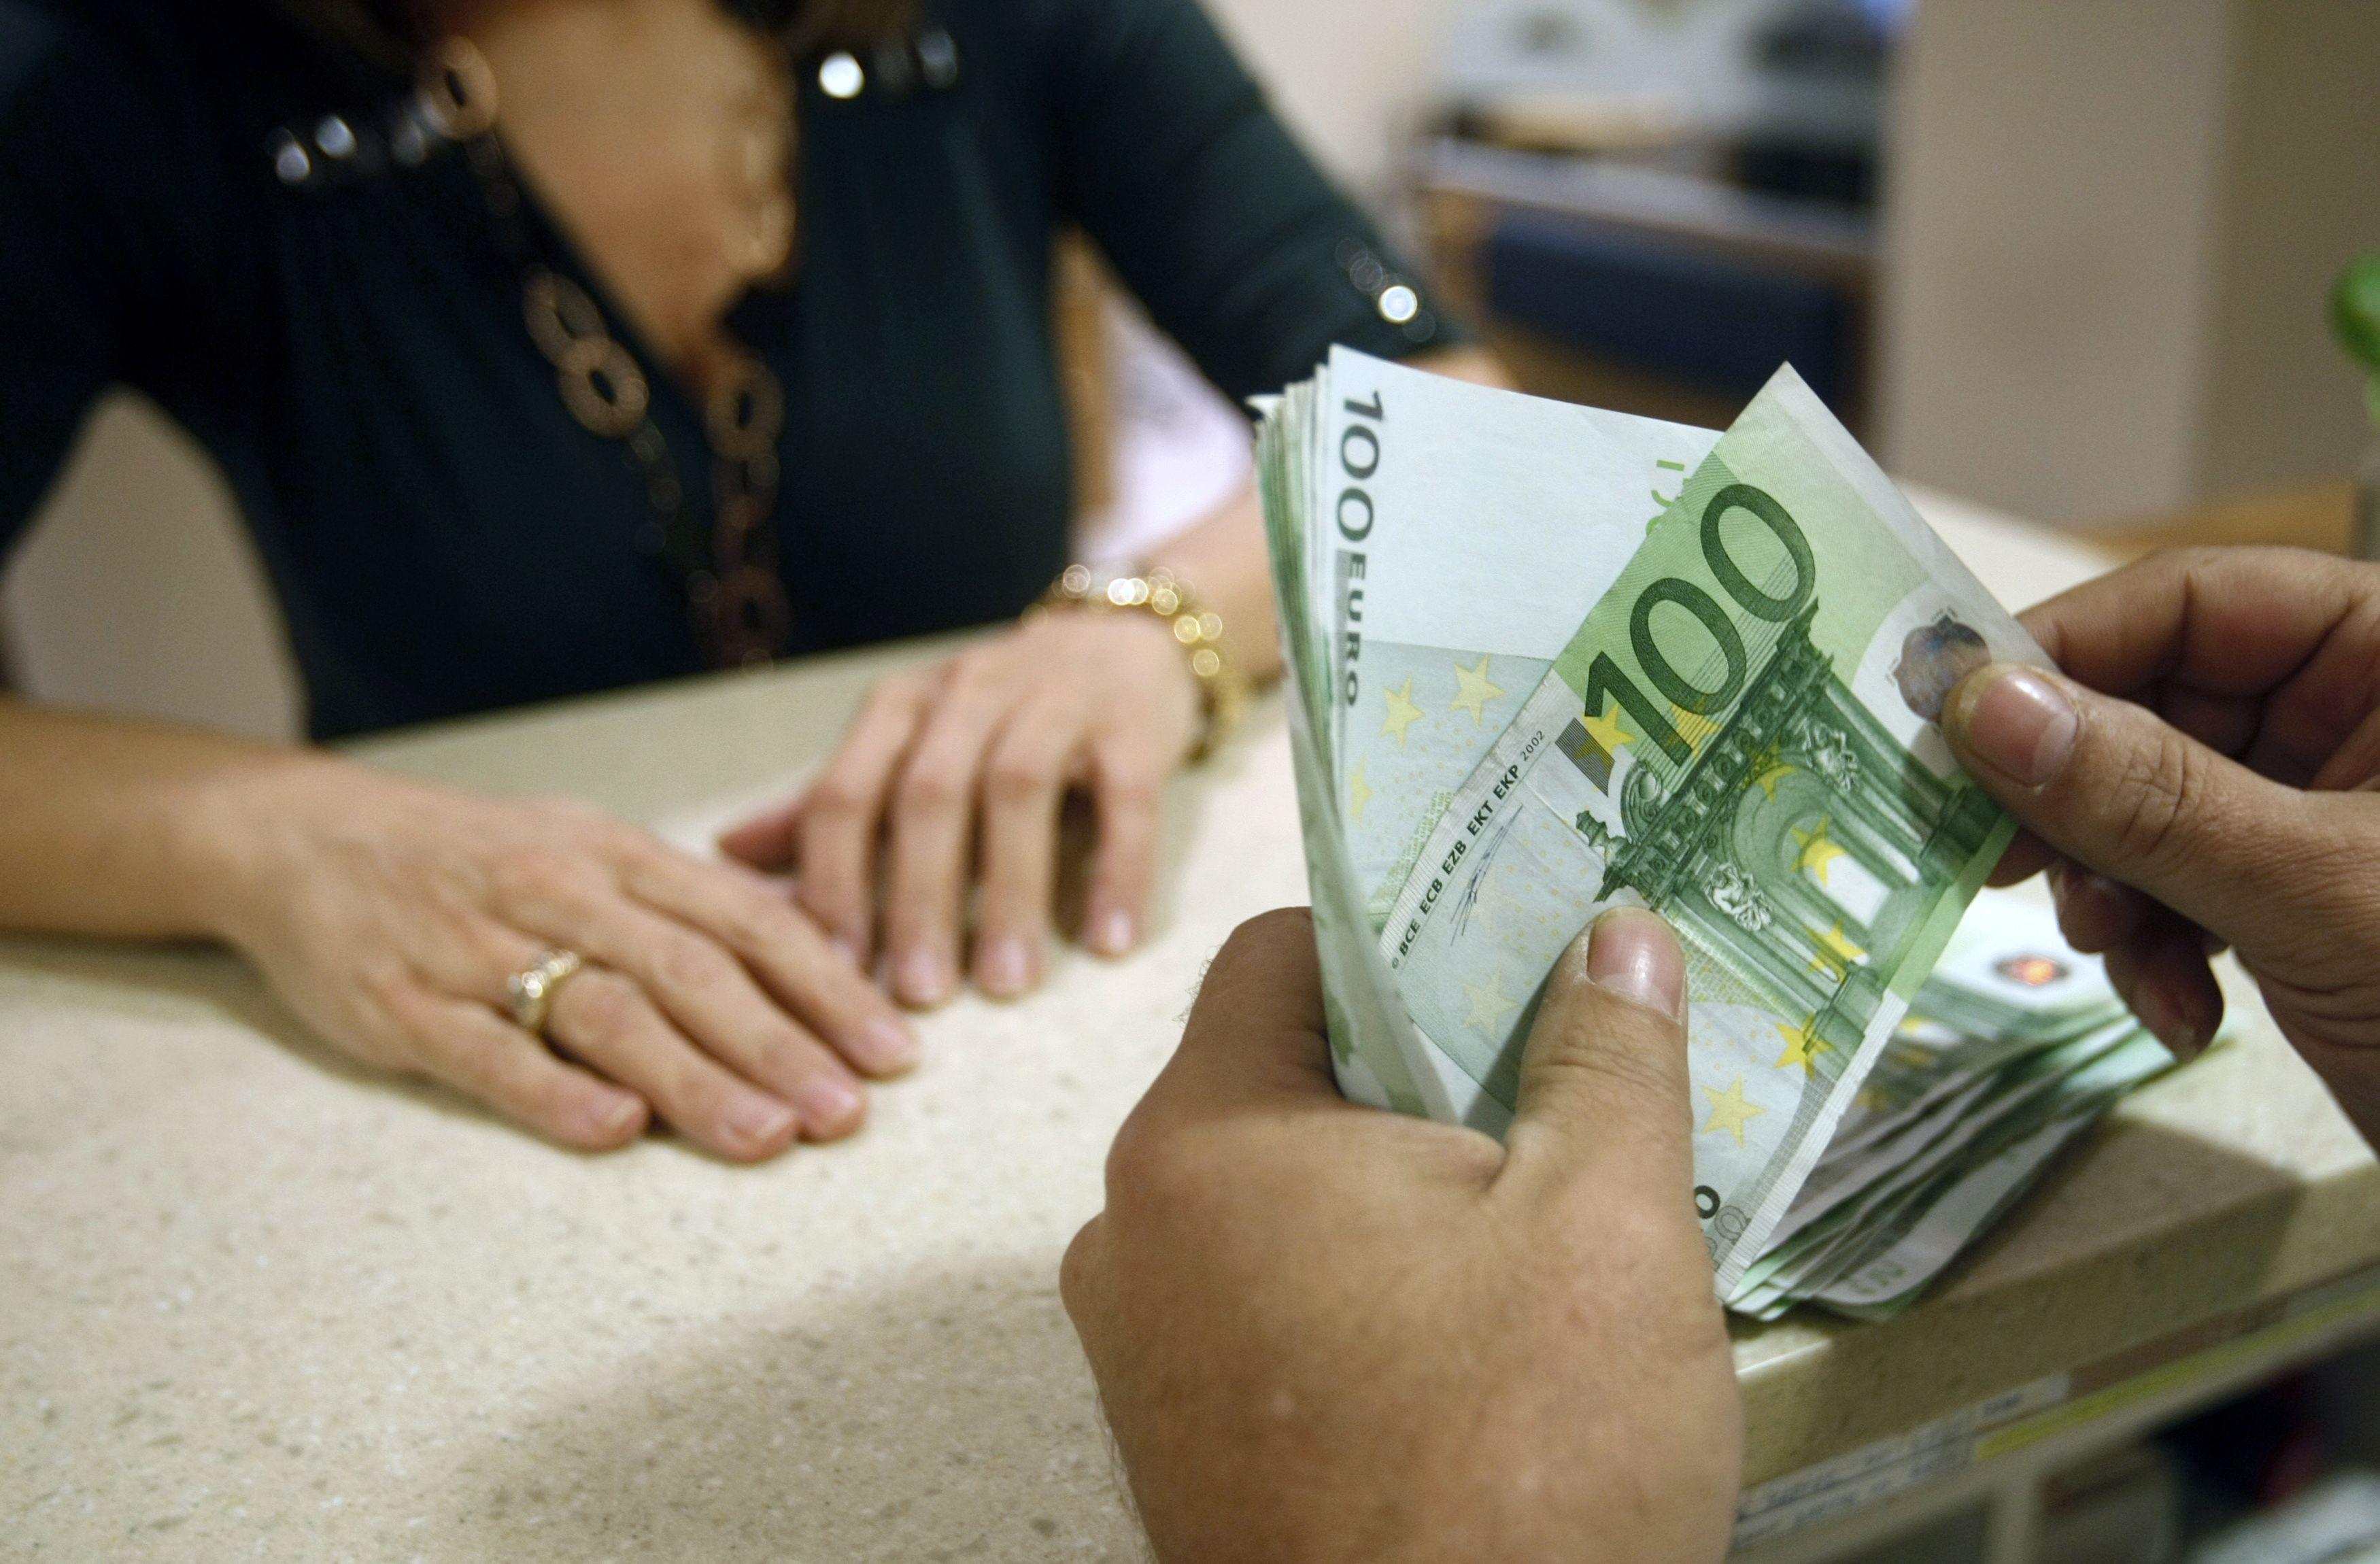 Центробанк Кипра опубликовал отчёт по депозитам и кредитам за июль 2021 года